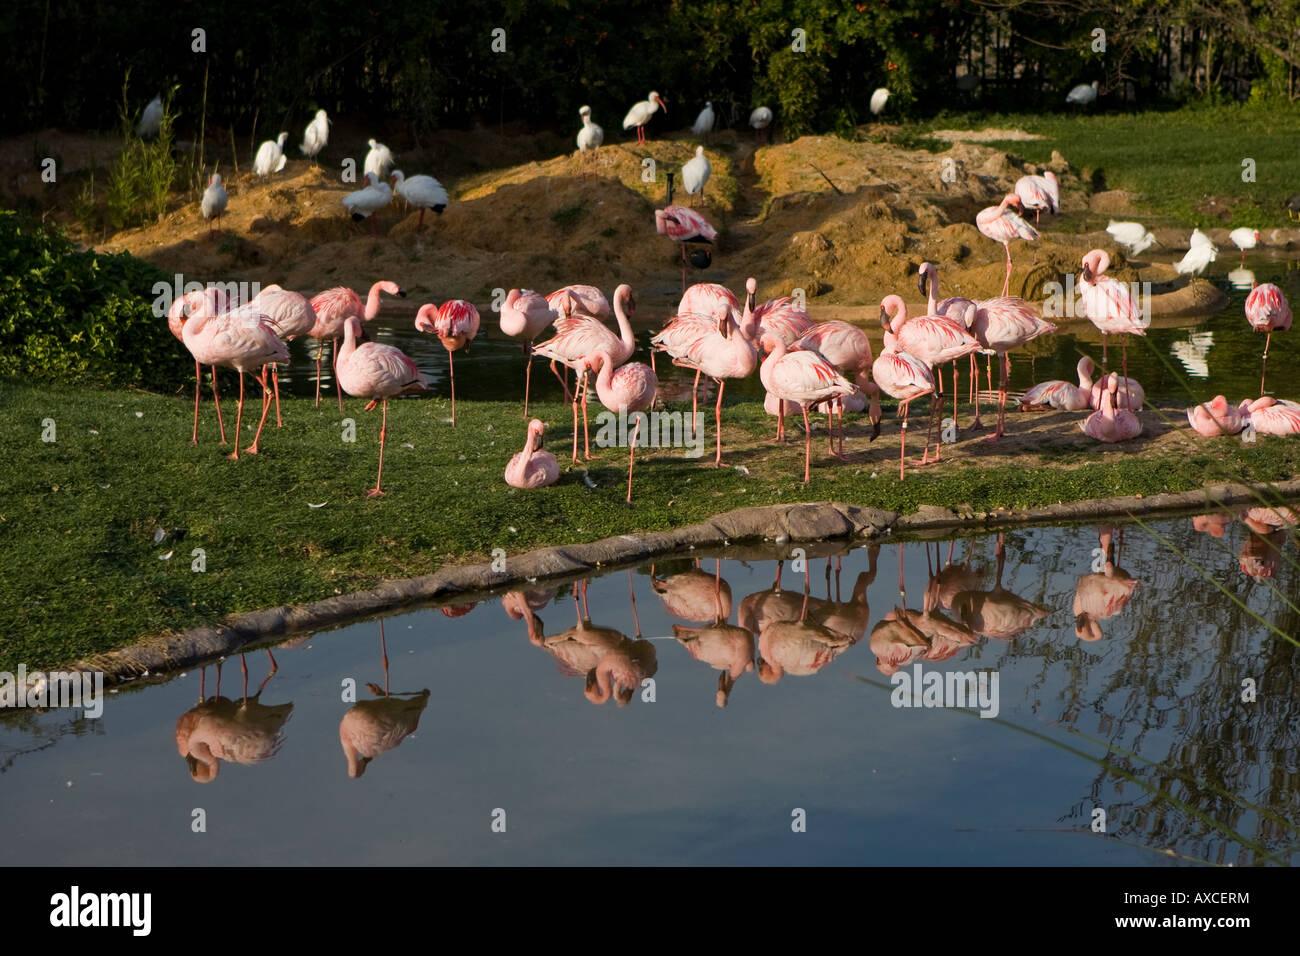 A Flock of Pink Flamingos at Busch Gardens Florida USA Stock Photo ...